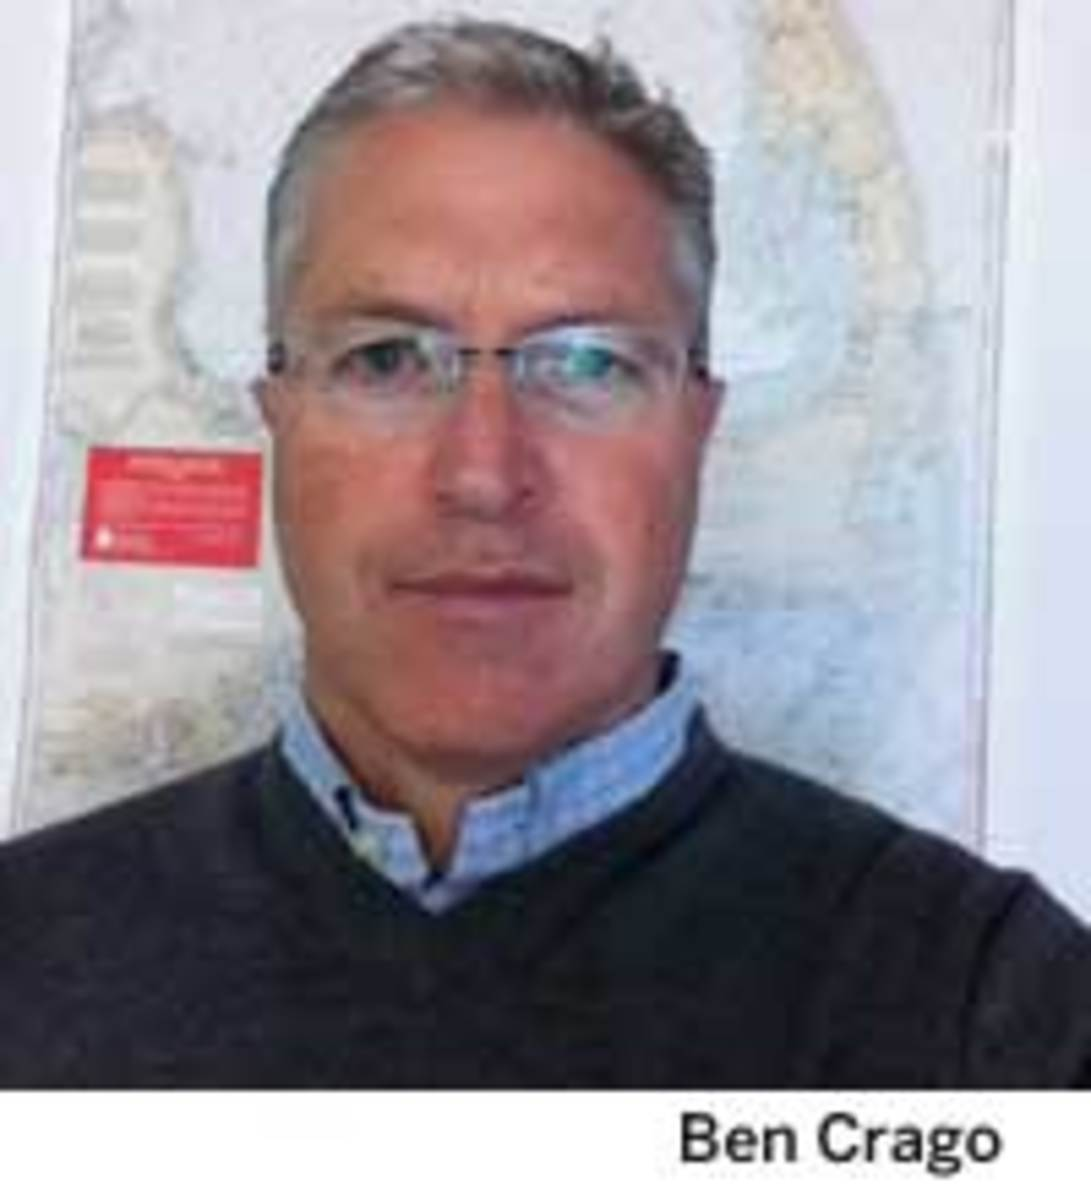 Ben Crago, Oyster Harbors Marine